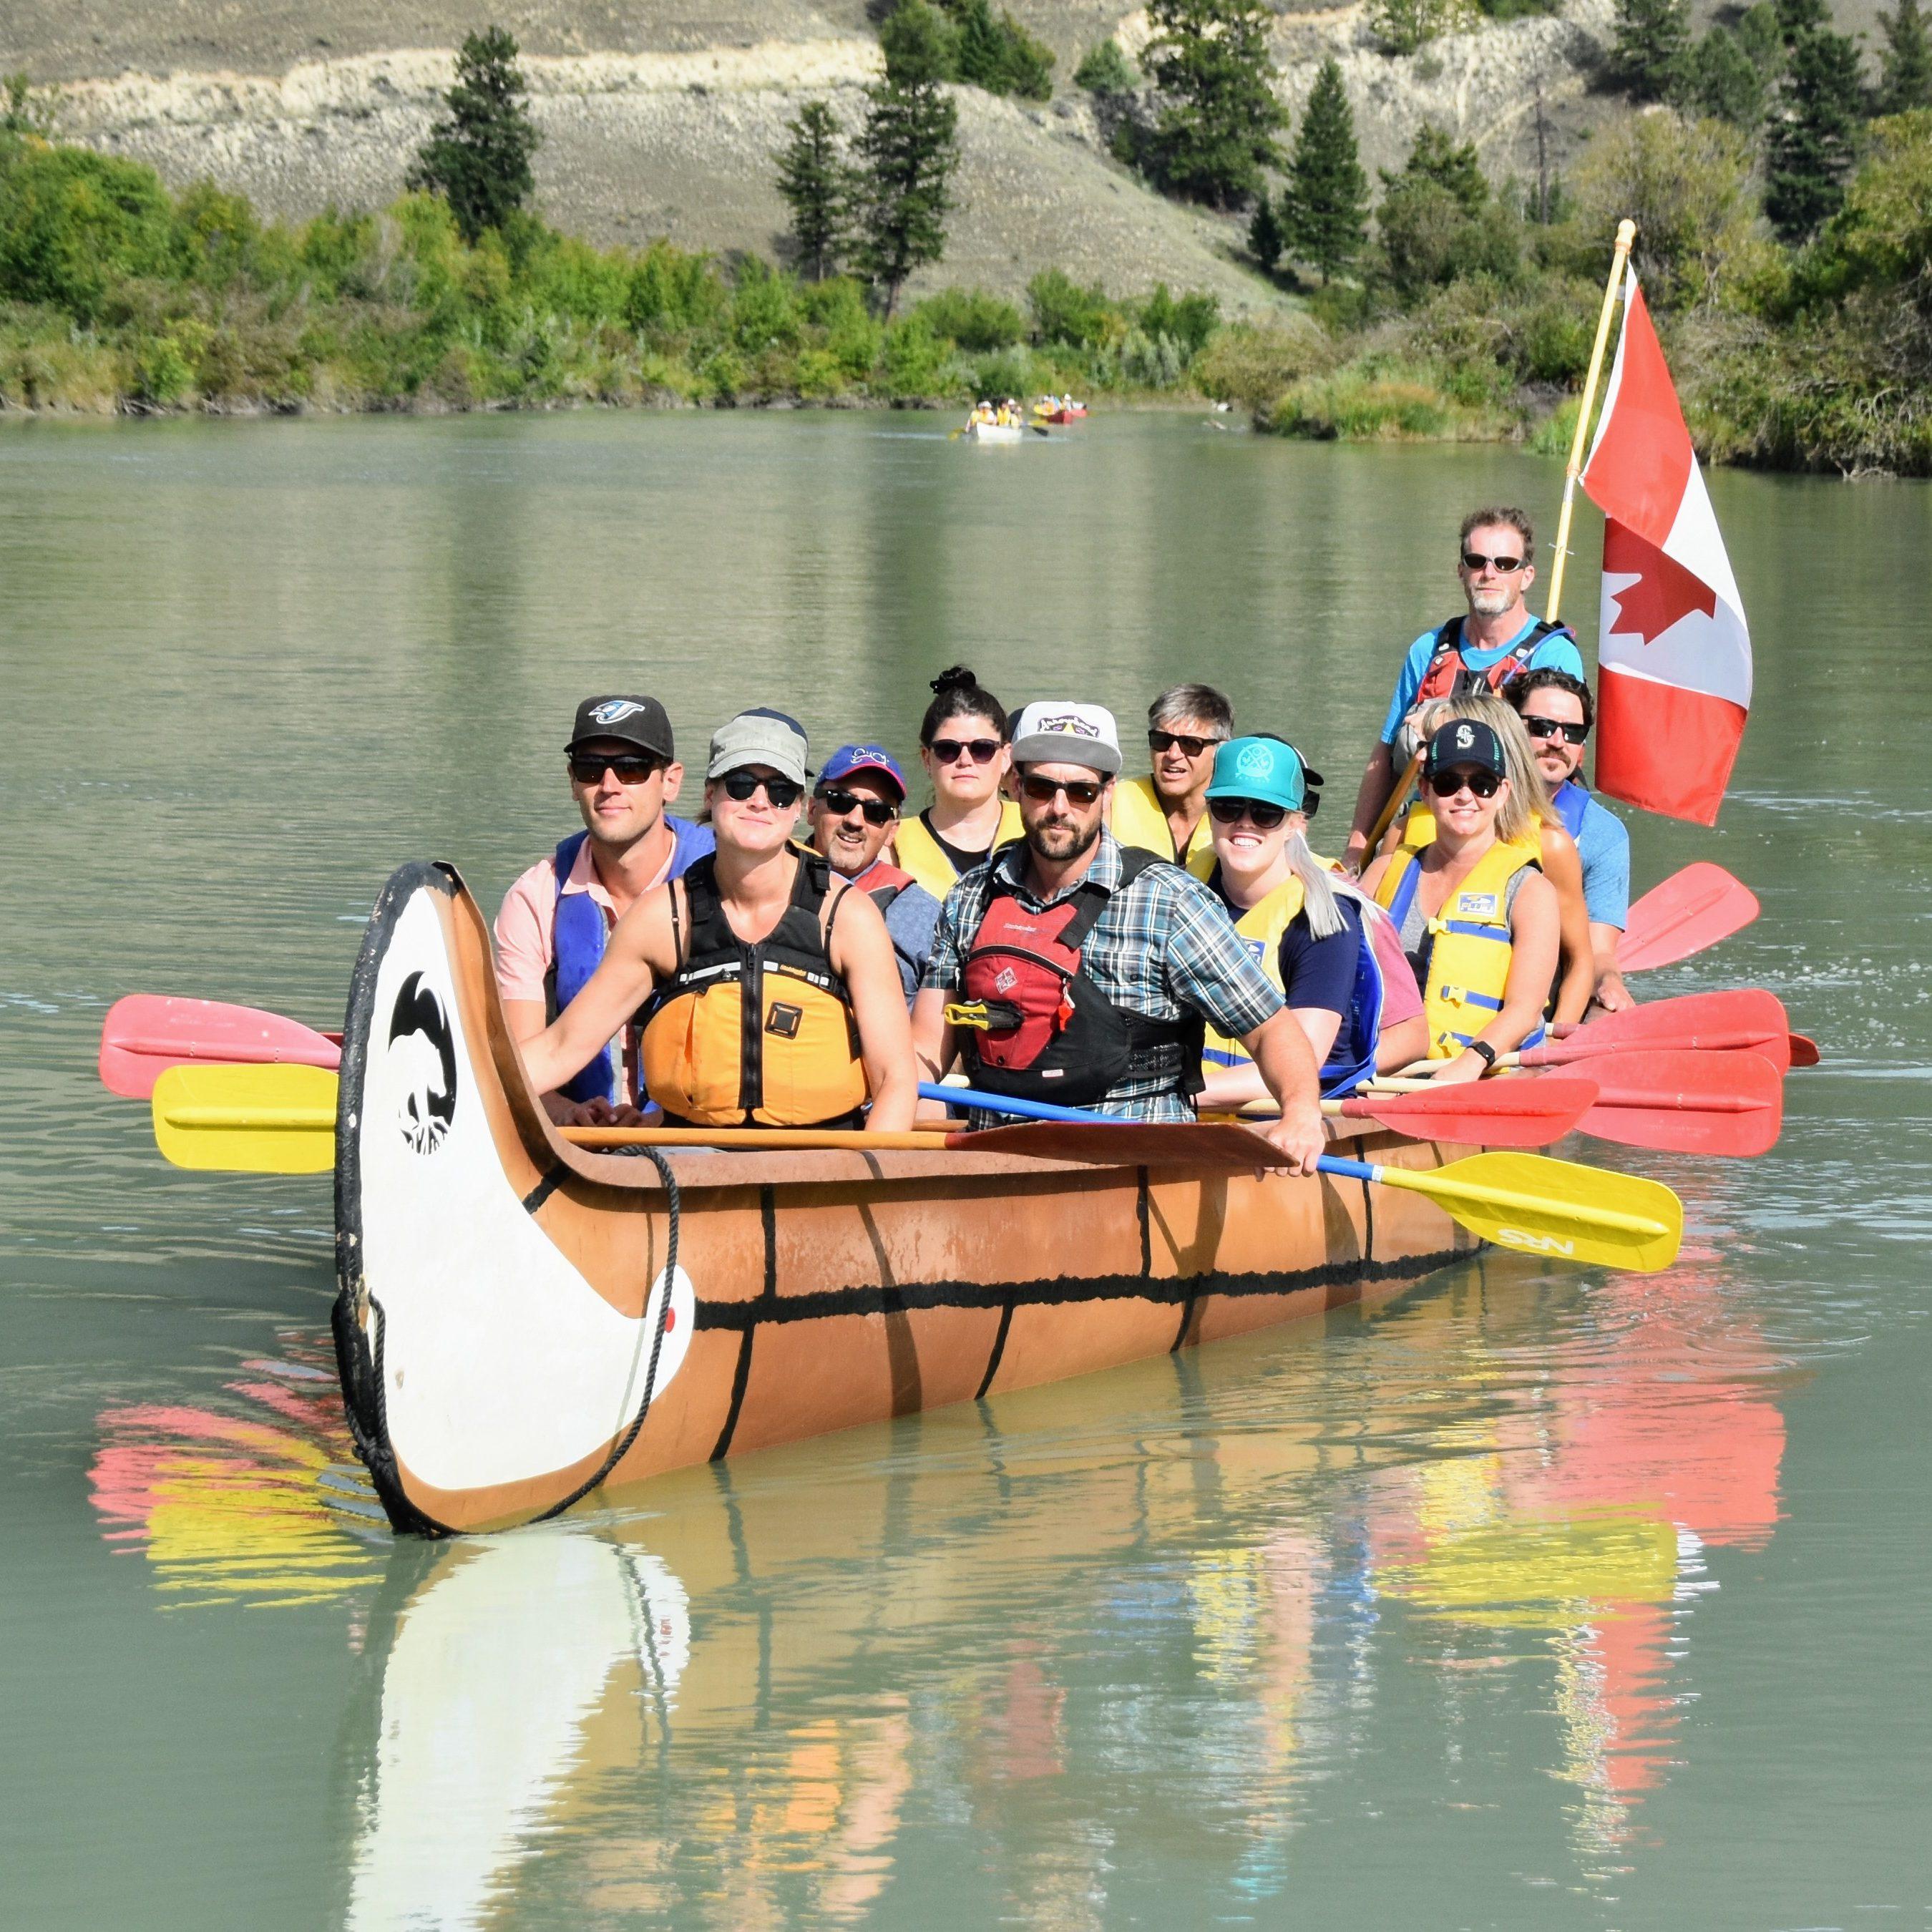 Interpretive Paddle in a big canoe